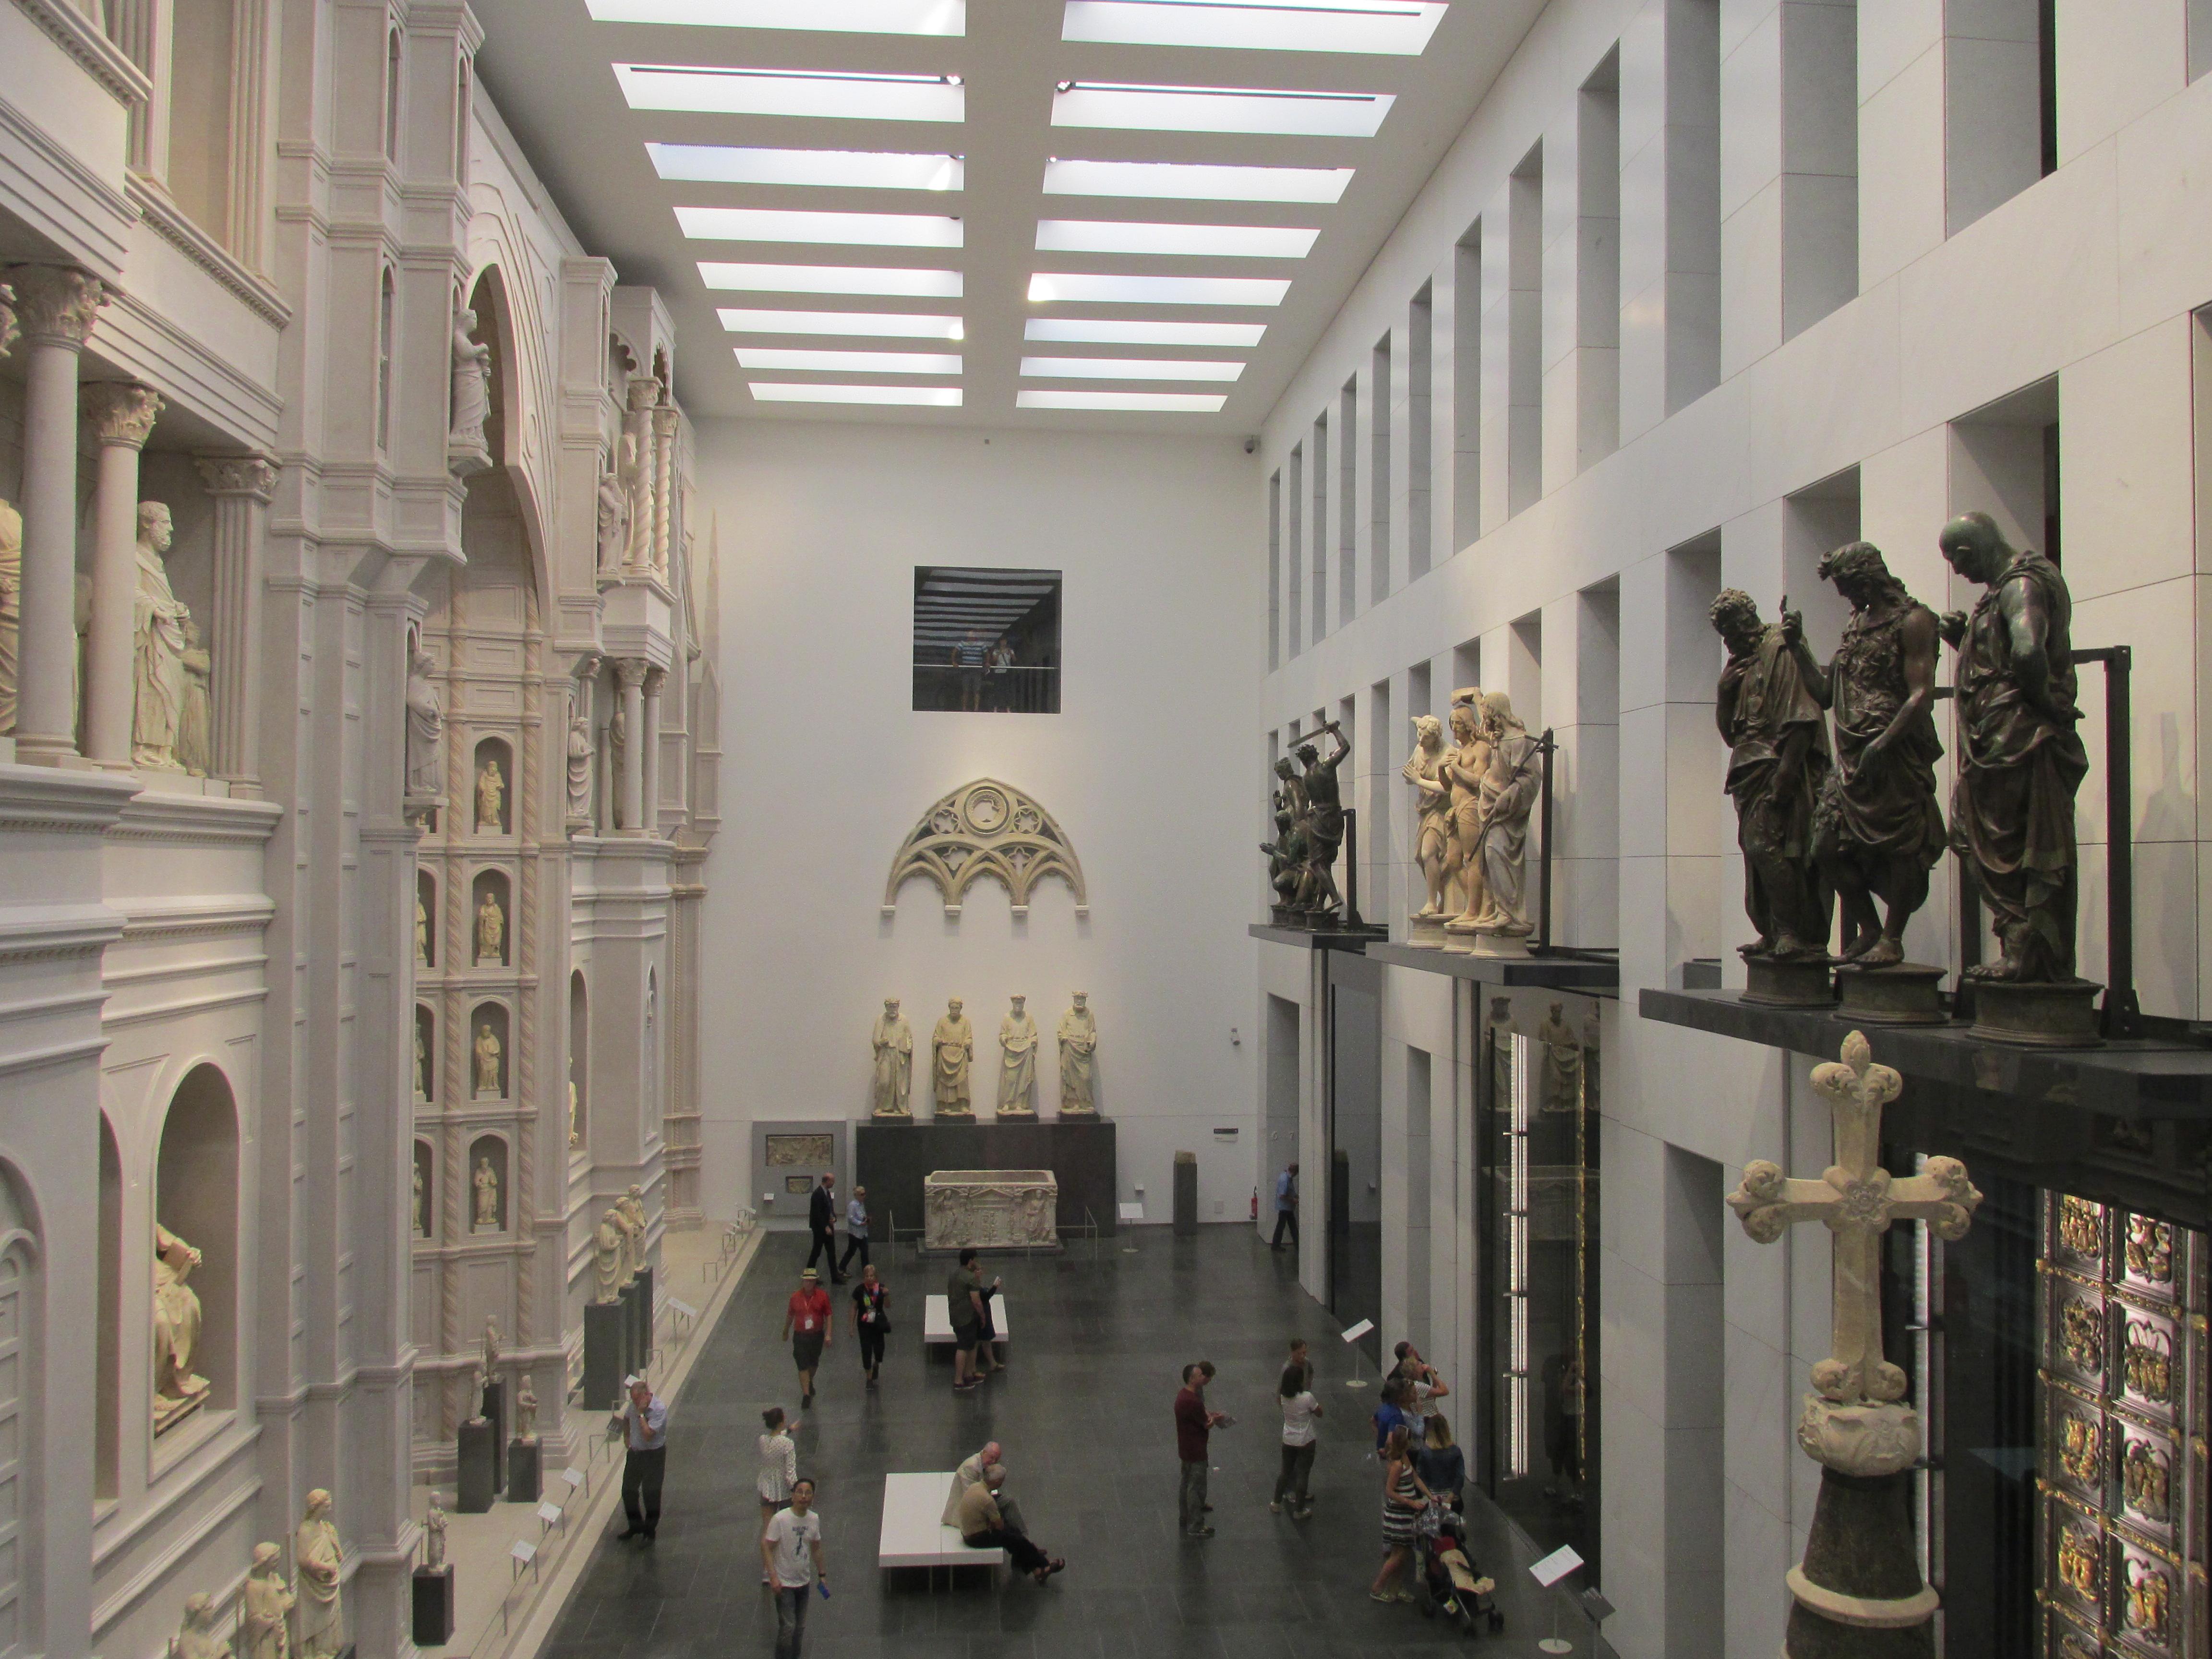 img 2833 - Visitando la Catedral Santa Maria del Fiore de Florencia I/III